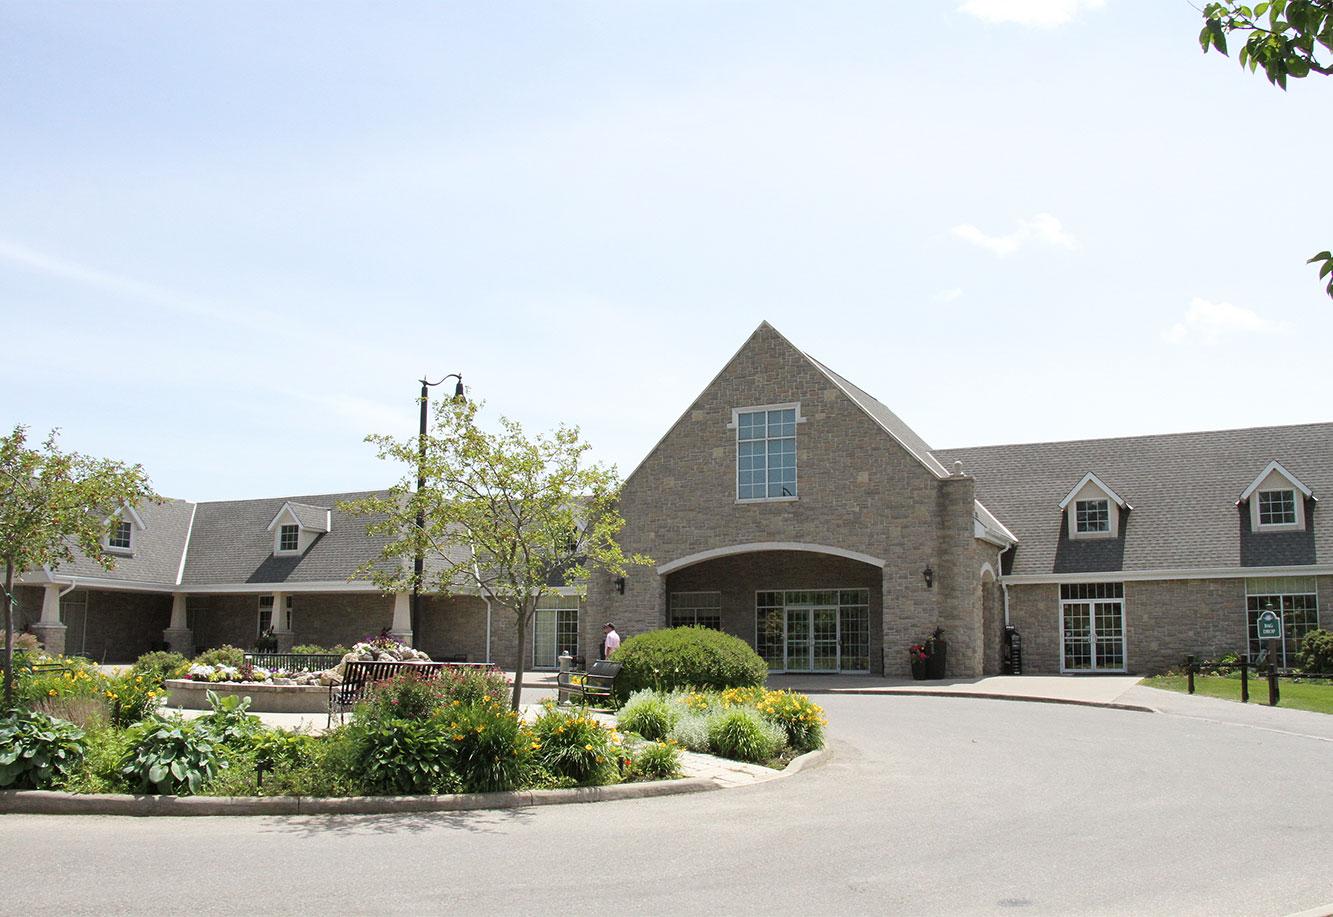 Brantford Golf Country Club